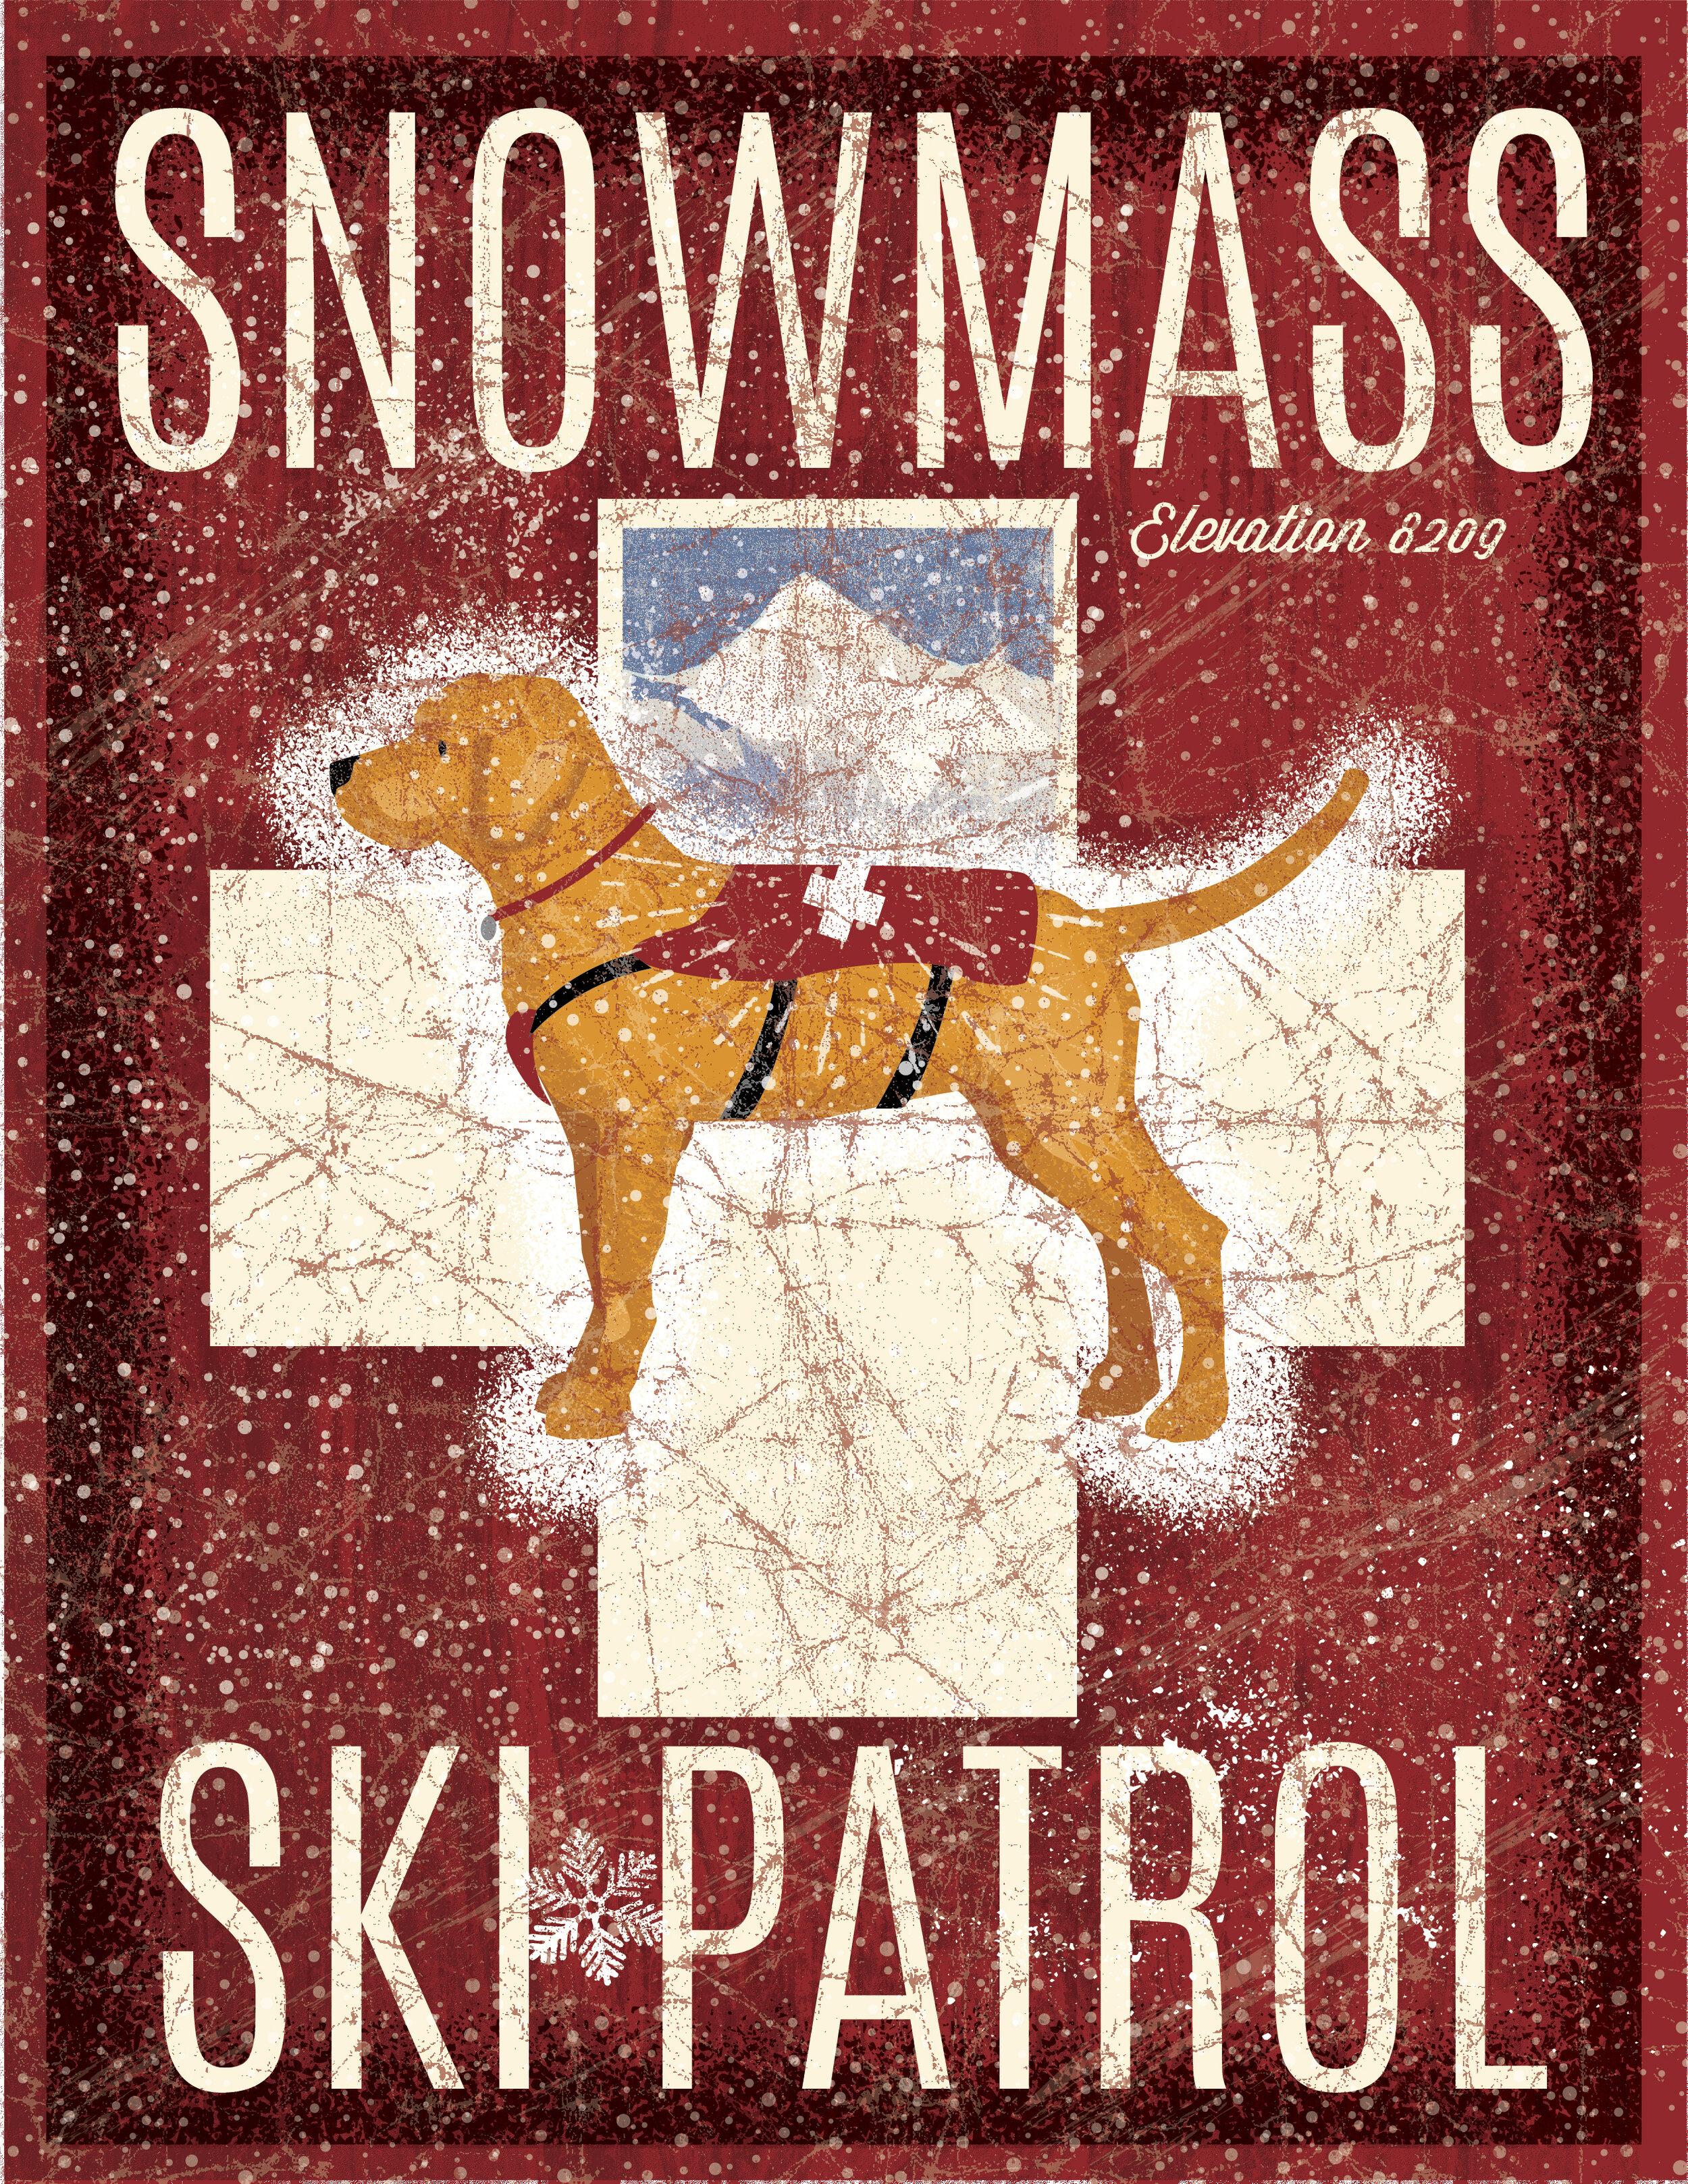 SNOWMASS SKI PATROL 8.5X11-01.jpg